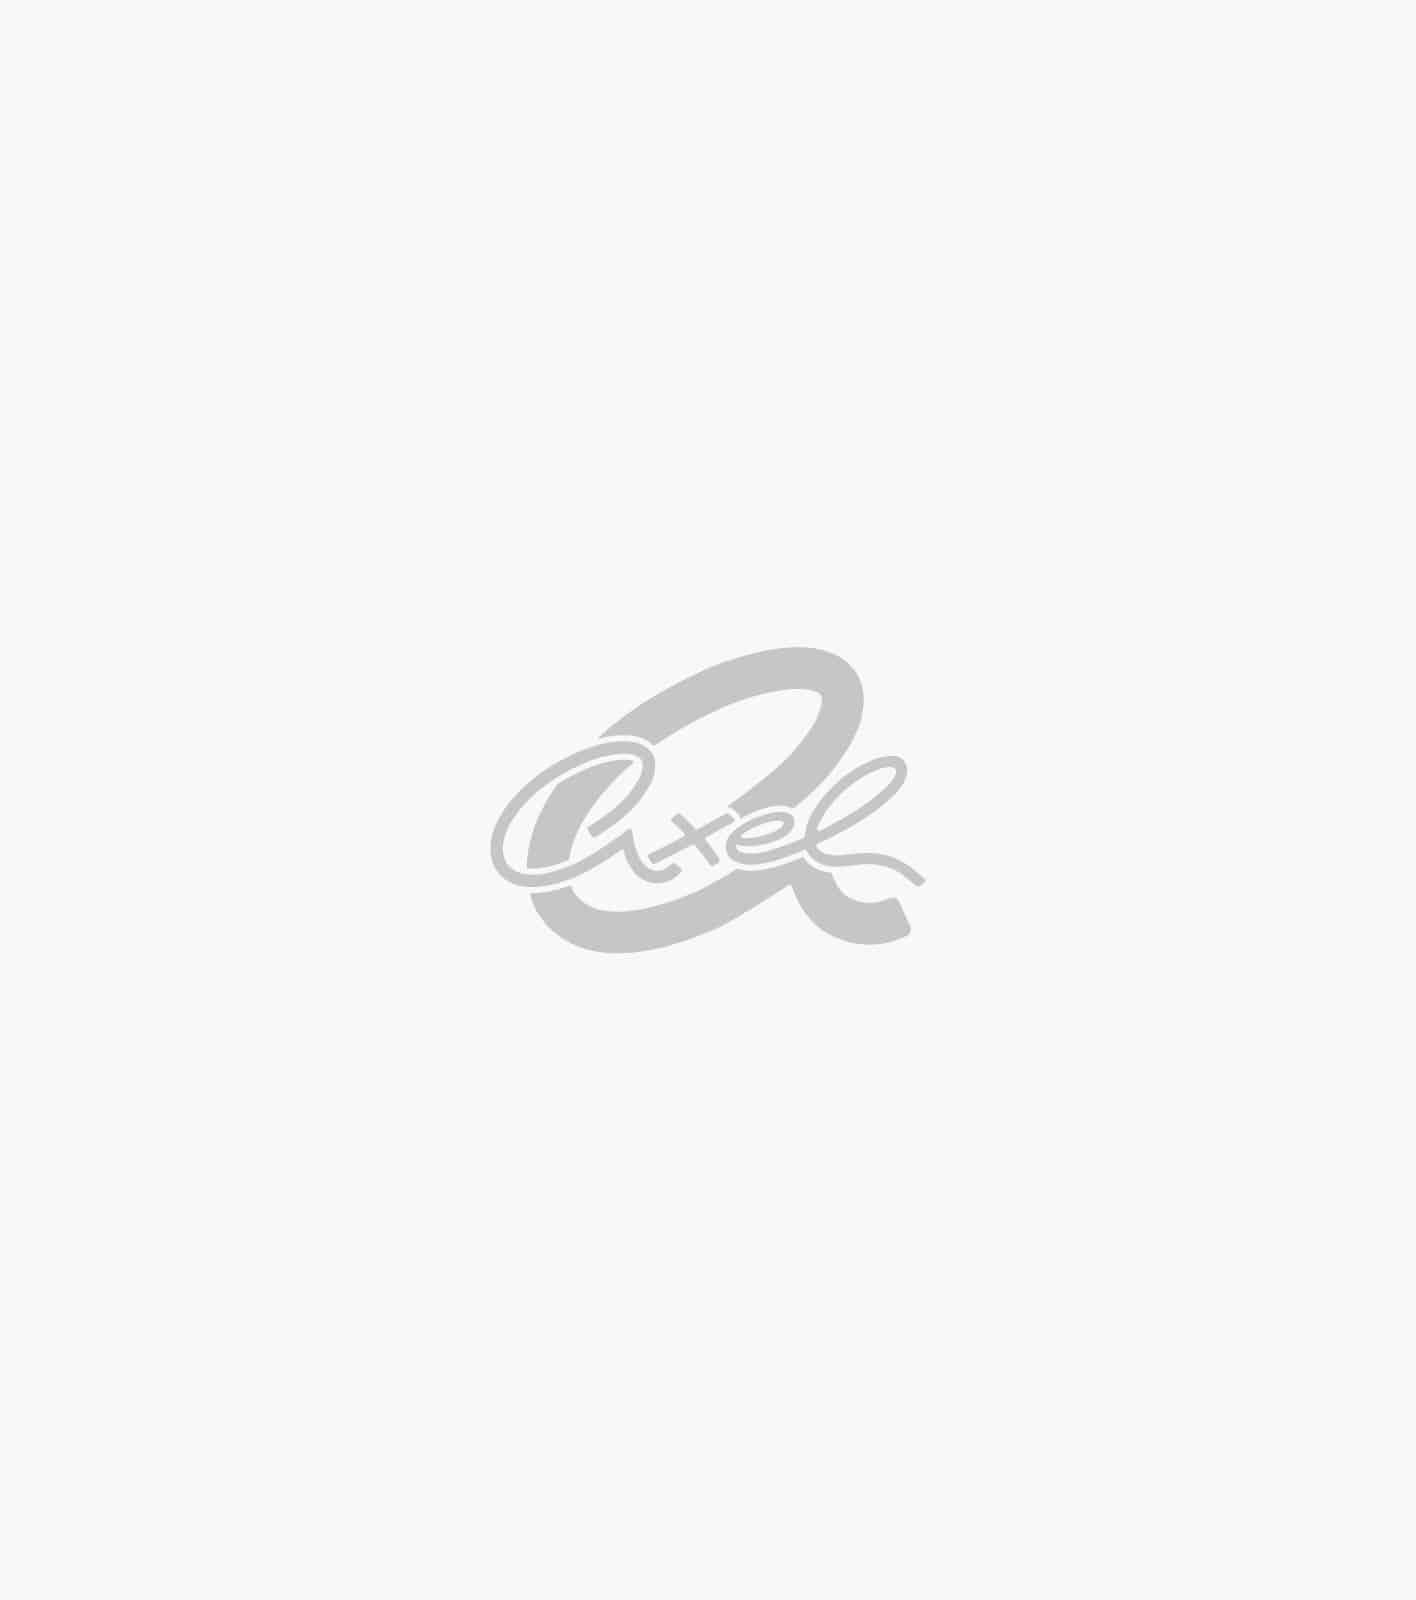 cf090854a10 Παπουτσια καλοκαιρινα Axel online αγορα